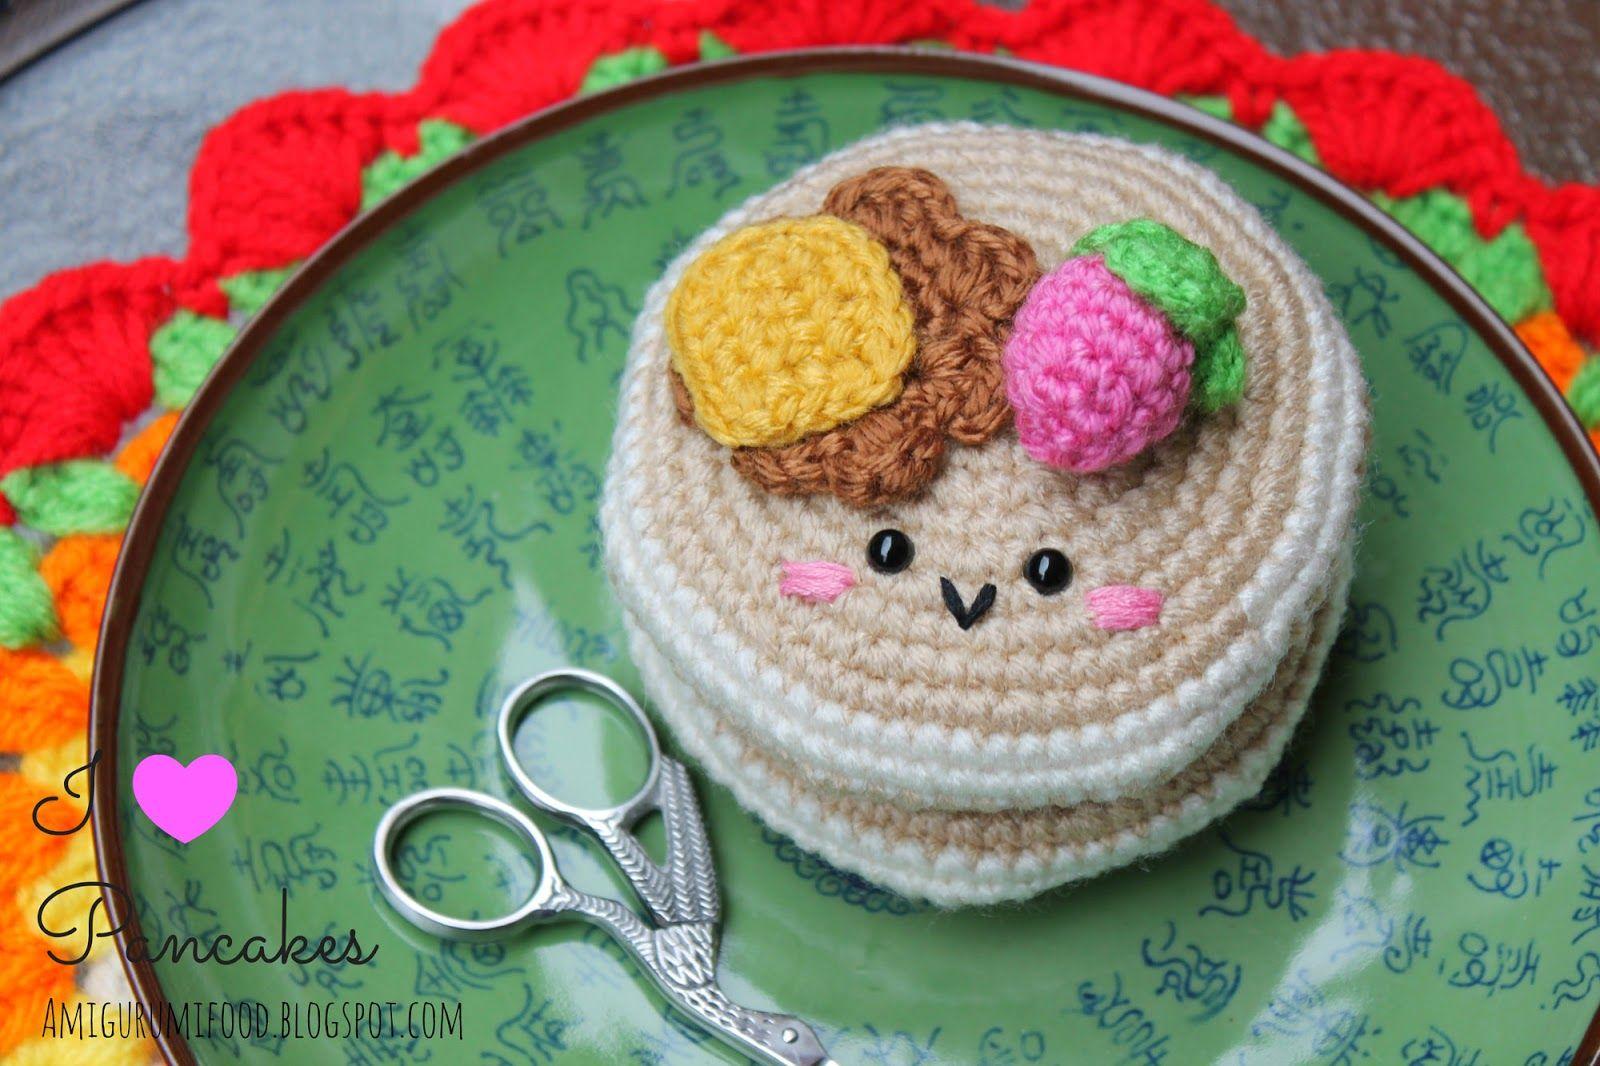 Amigurumi food pancakes amigurumi free pattern crochet food crochet amigurumi food pancakes amigurumi free pattern bankloansurffo Choice Image